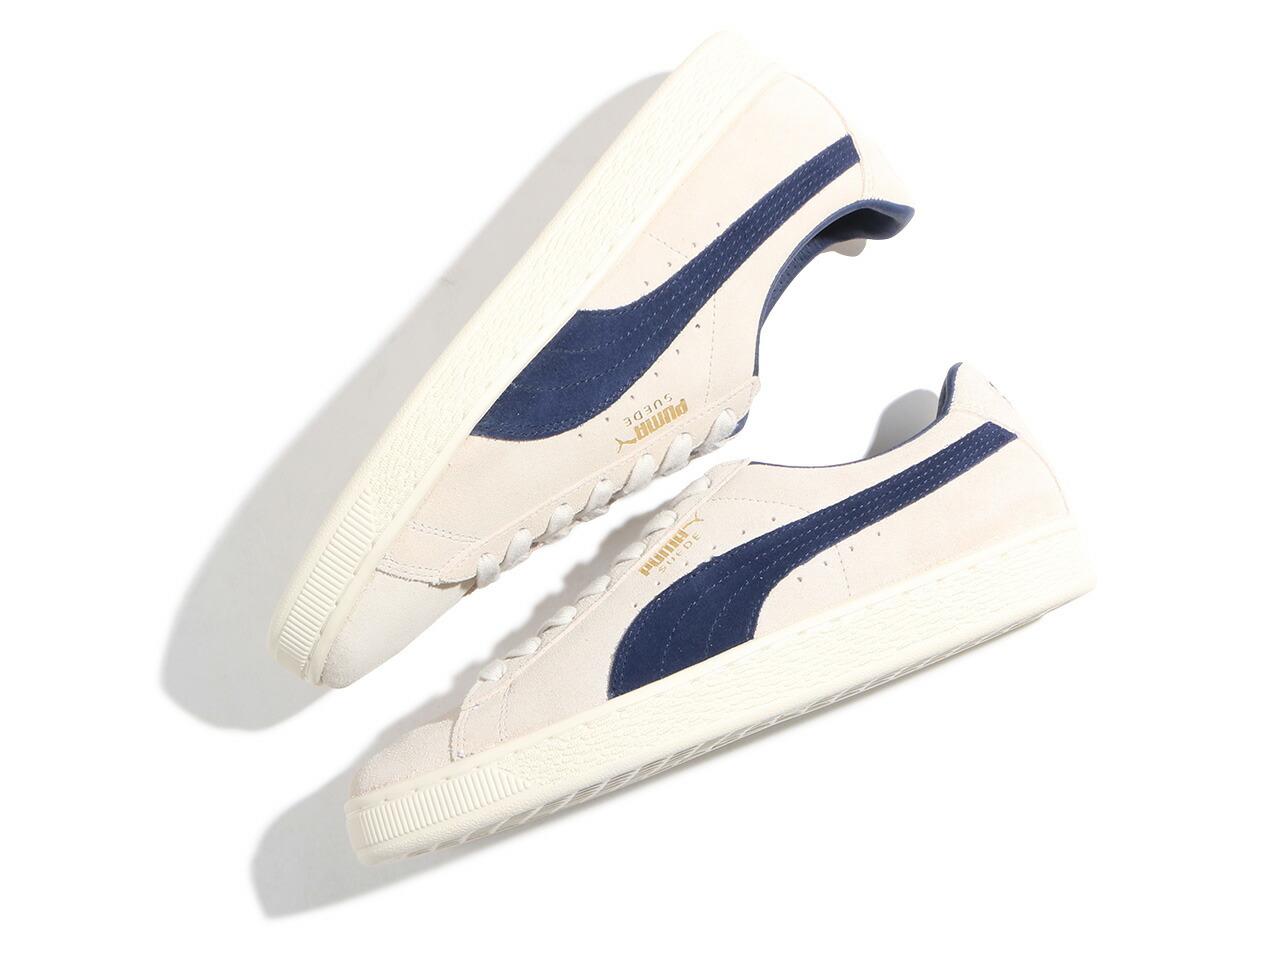 77af4328b9c 90年代に販売していたモデルをベースに、インソールにカップソールを採用。 より快適な履き心地を体感できるようになったアップデートモデル。